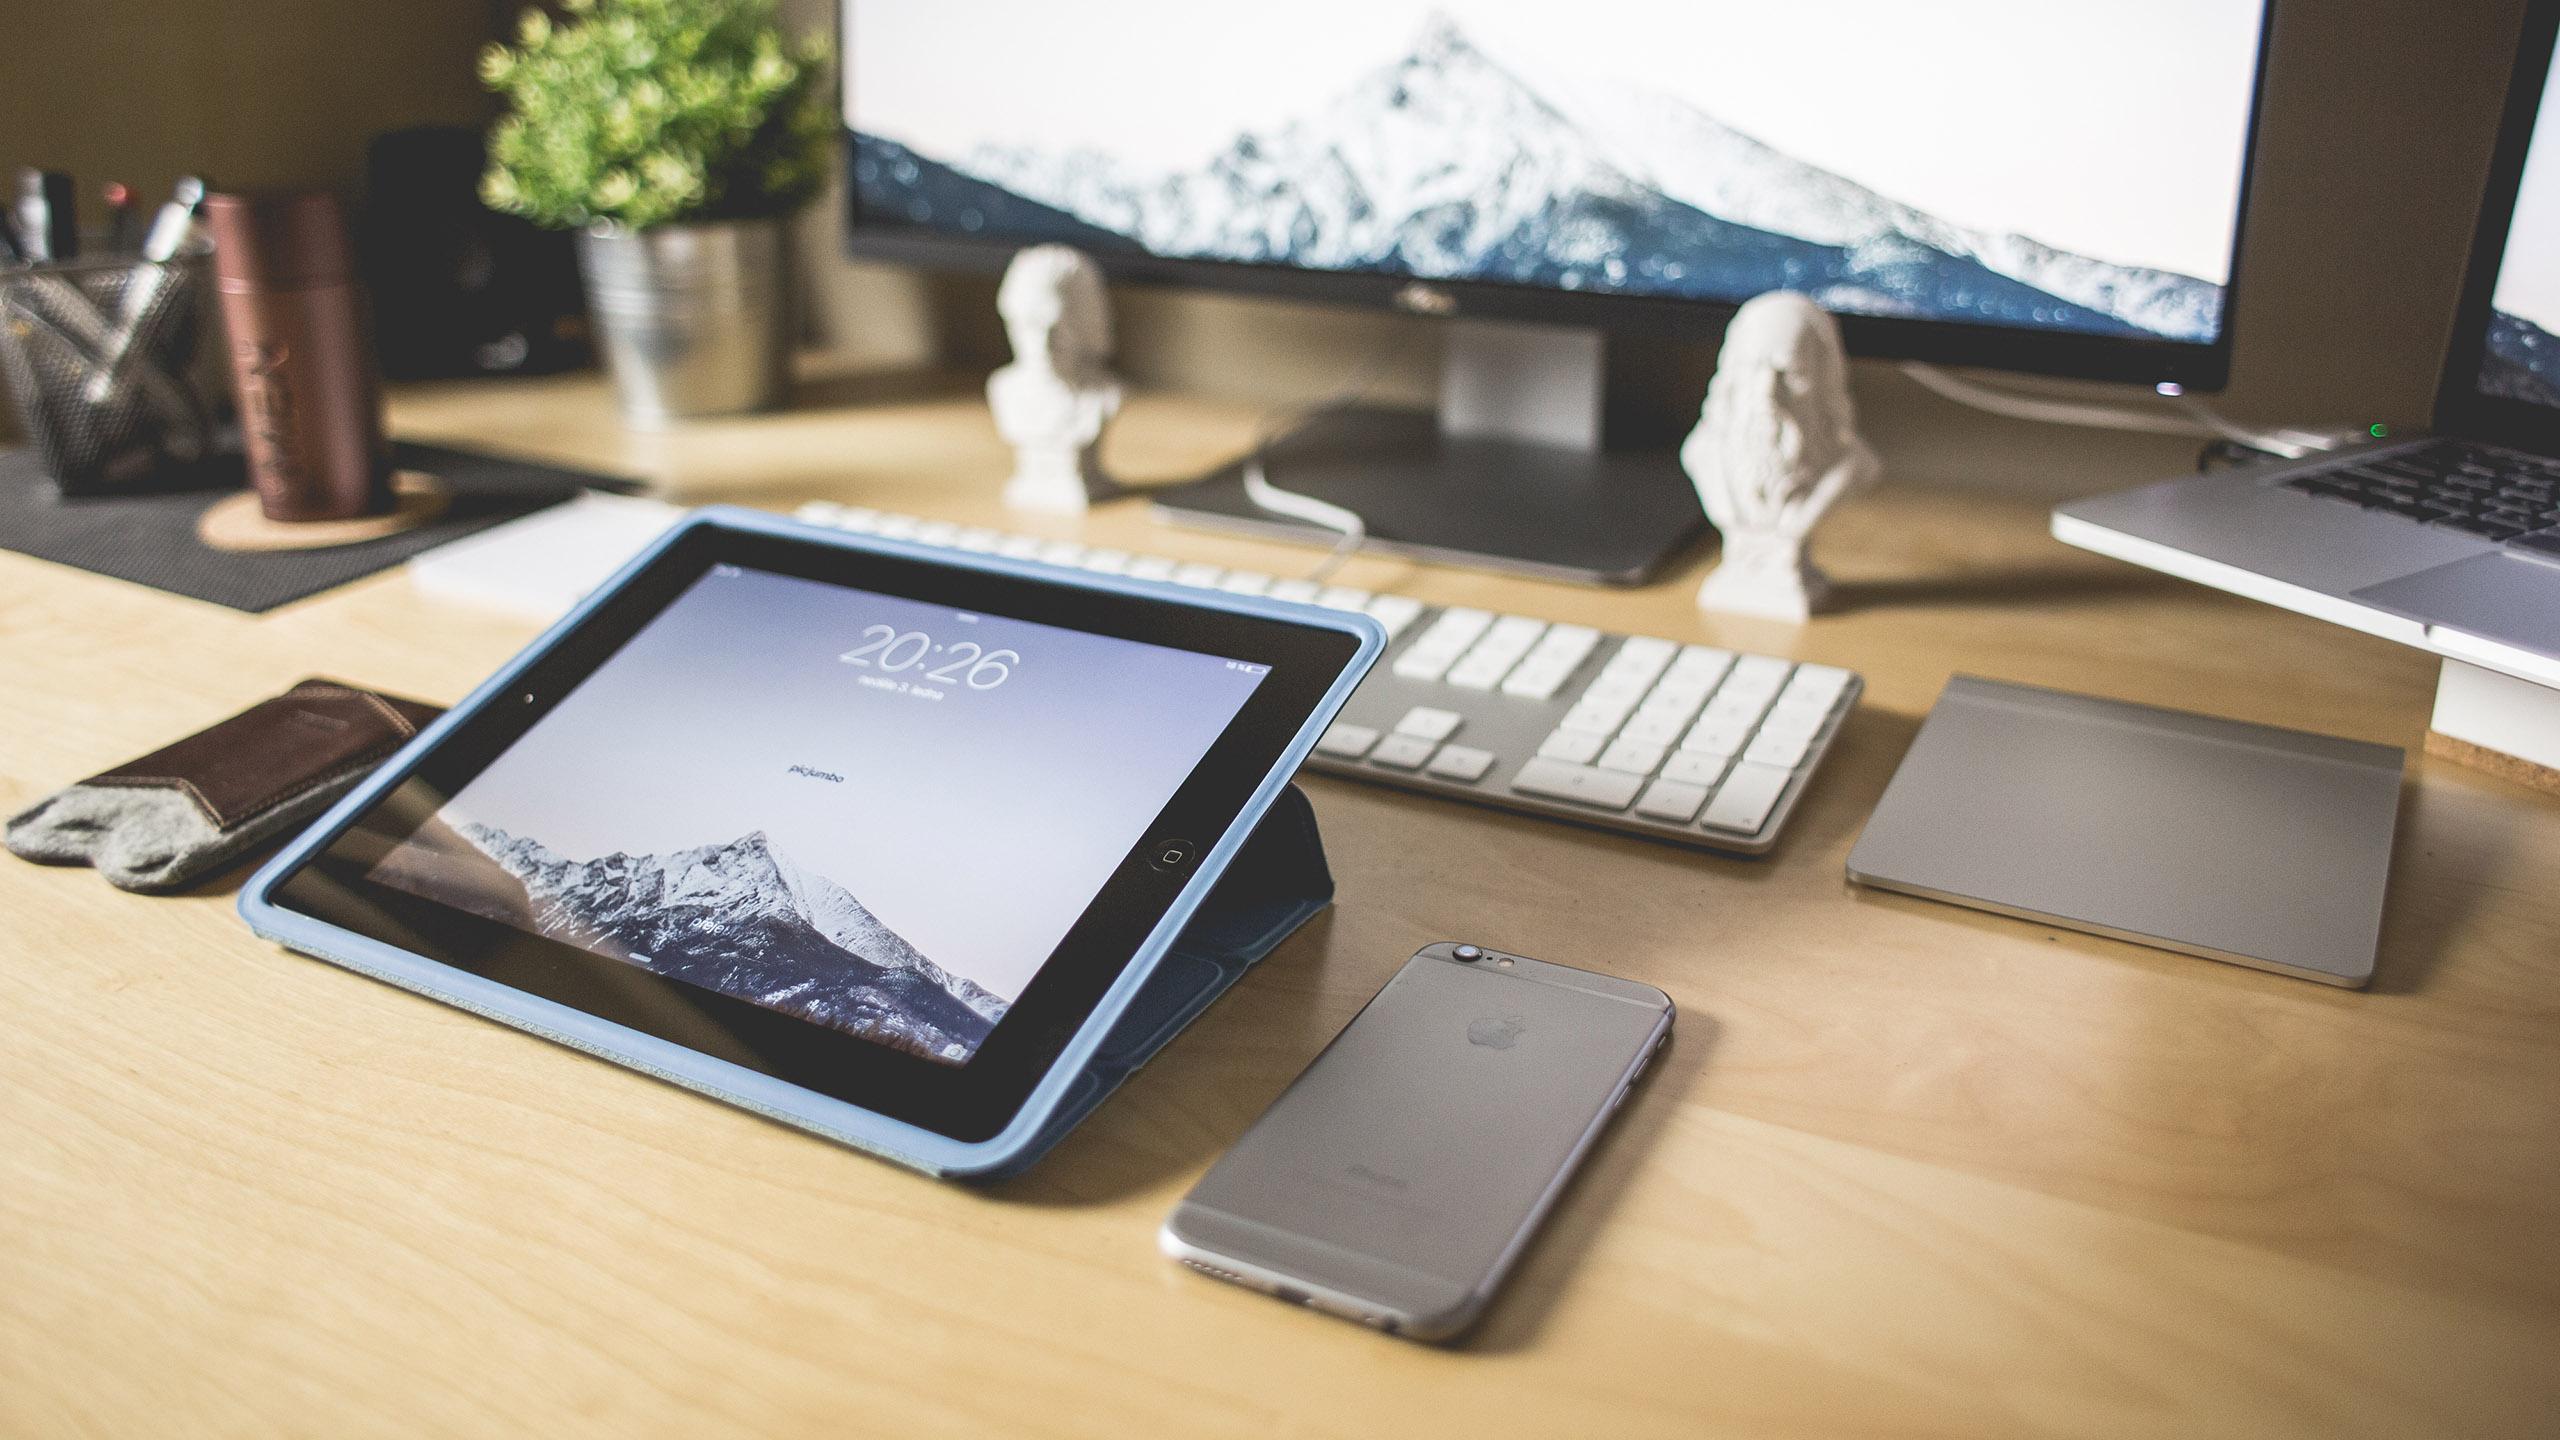 Рабочее пространство с iPad и iPhone